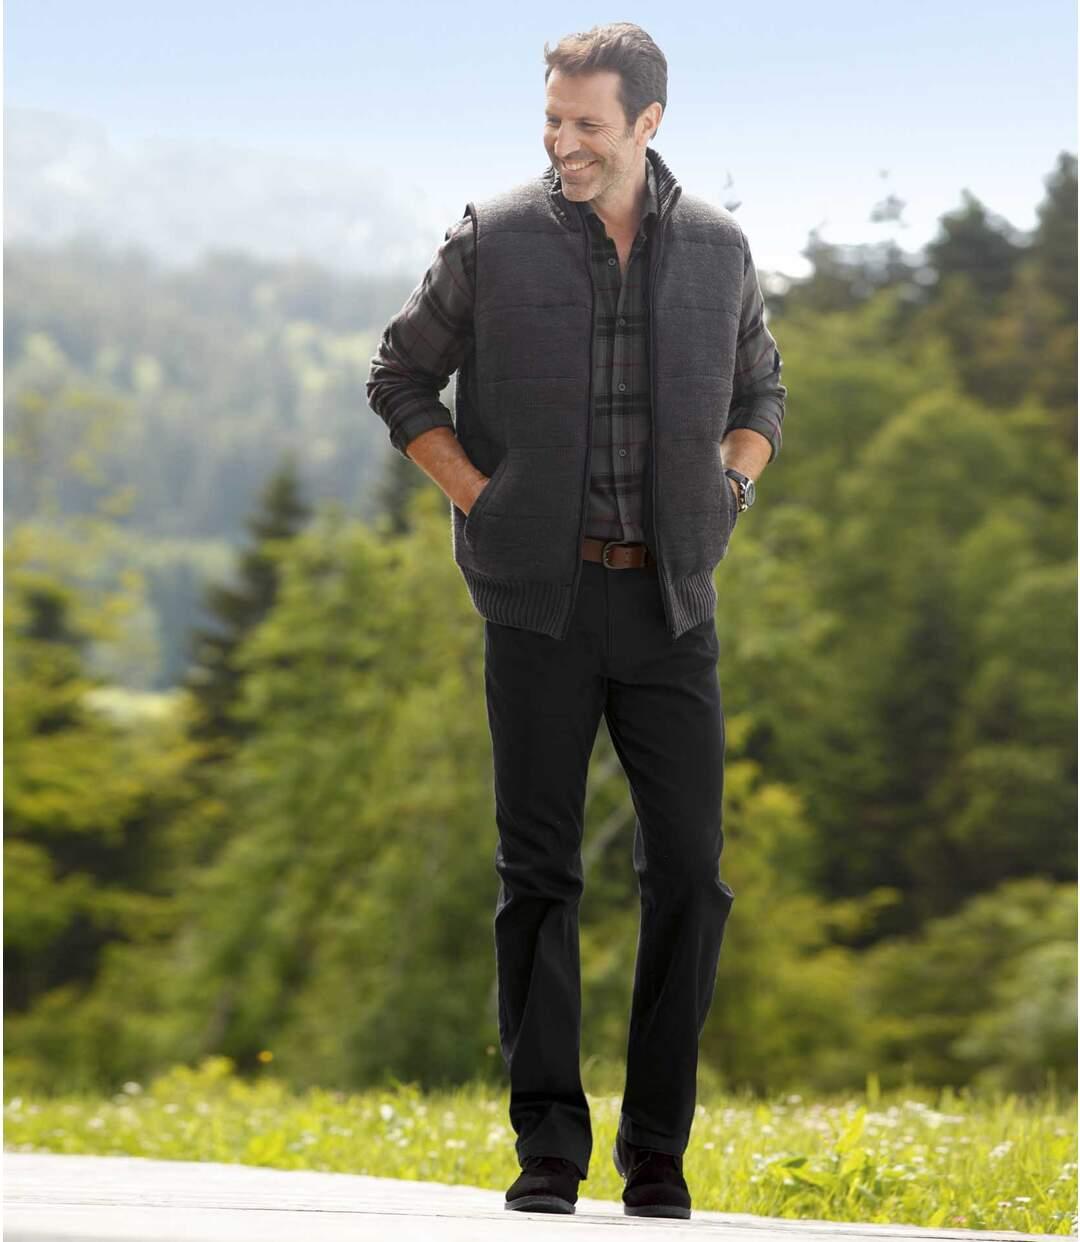 Men's Regular Cut Black Twill StretchTrousers